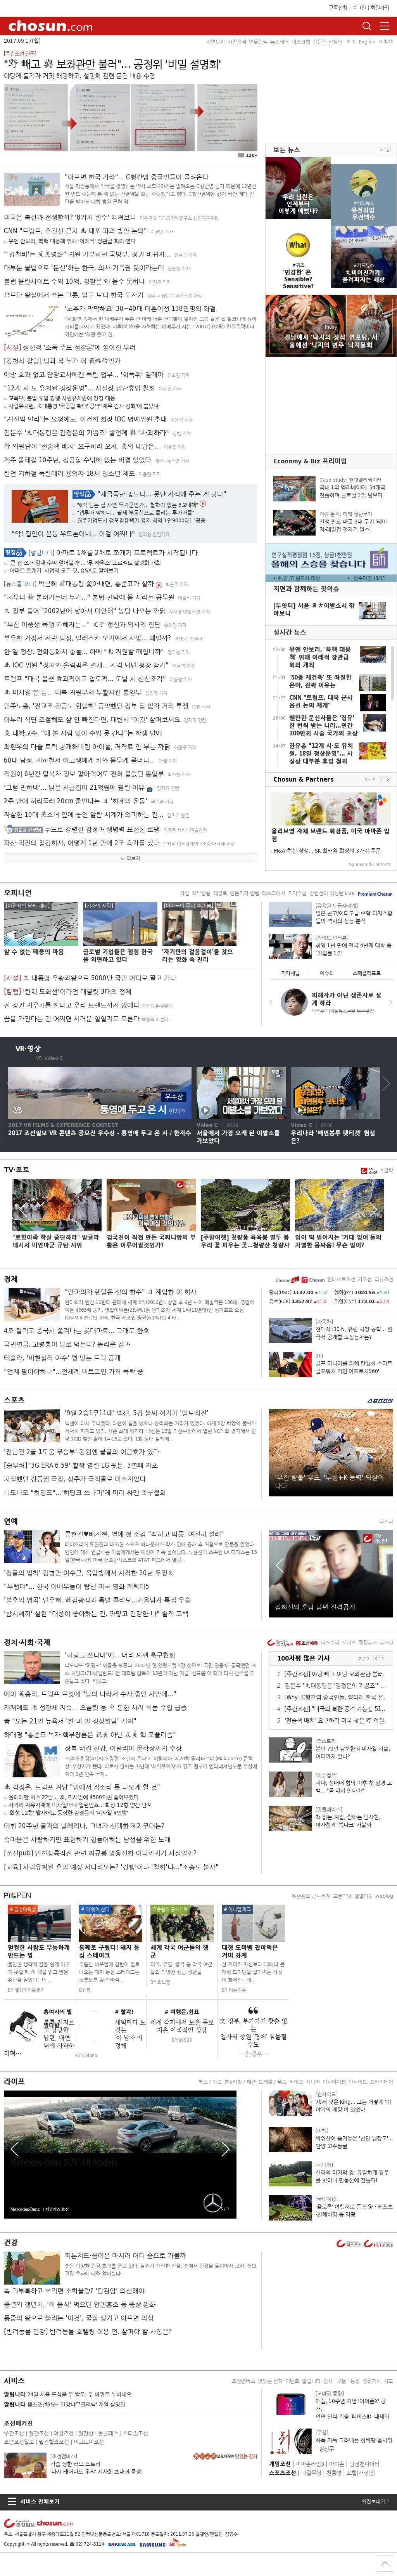 chosun.com at Saturday Sept. 16, 2017, 11:02 p.m. UTC